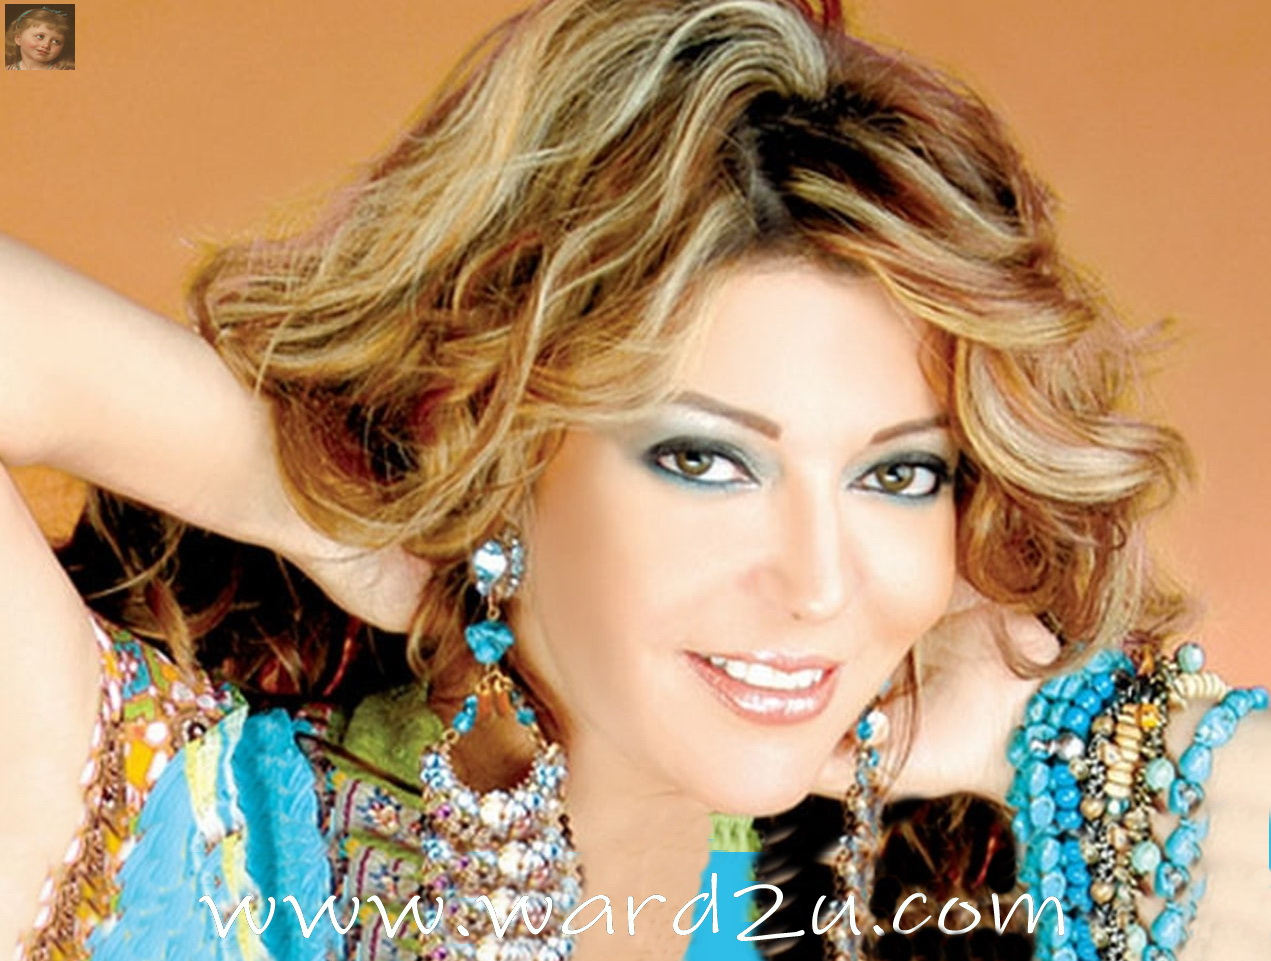 تحميل اغاني سميرة سعيد mp3 مجانا